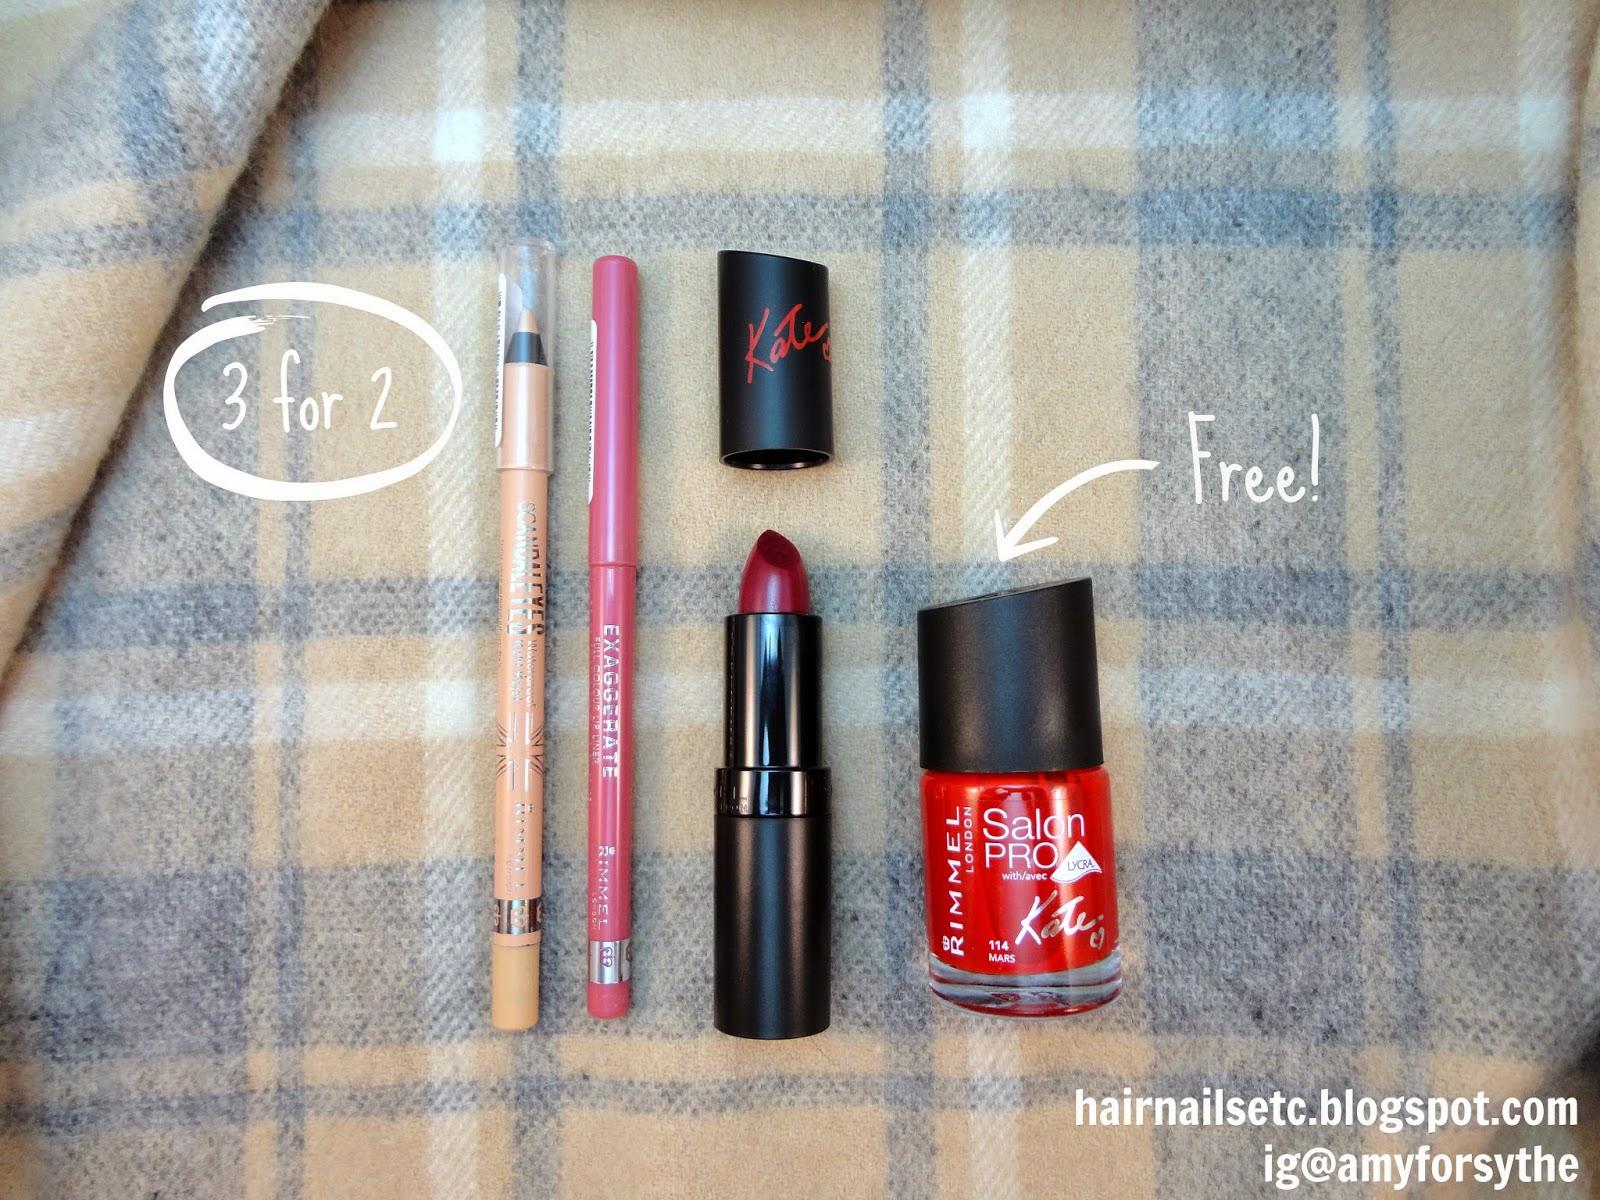 Boots UK Beauty Haul - Rimmel Scandal Eyes Kohl Liner, Rimmel Exaggerate Lip Liner, Rimmel Kate Lasting Finish Lipstick, Rimmel Salon Pro by Kate Nail Polish